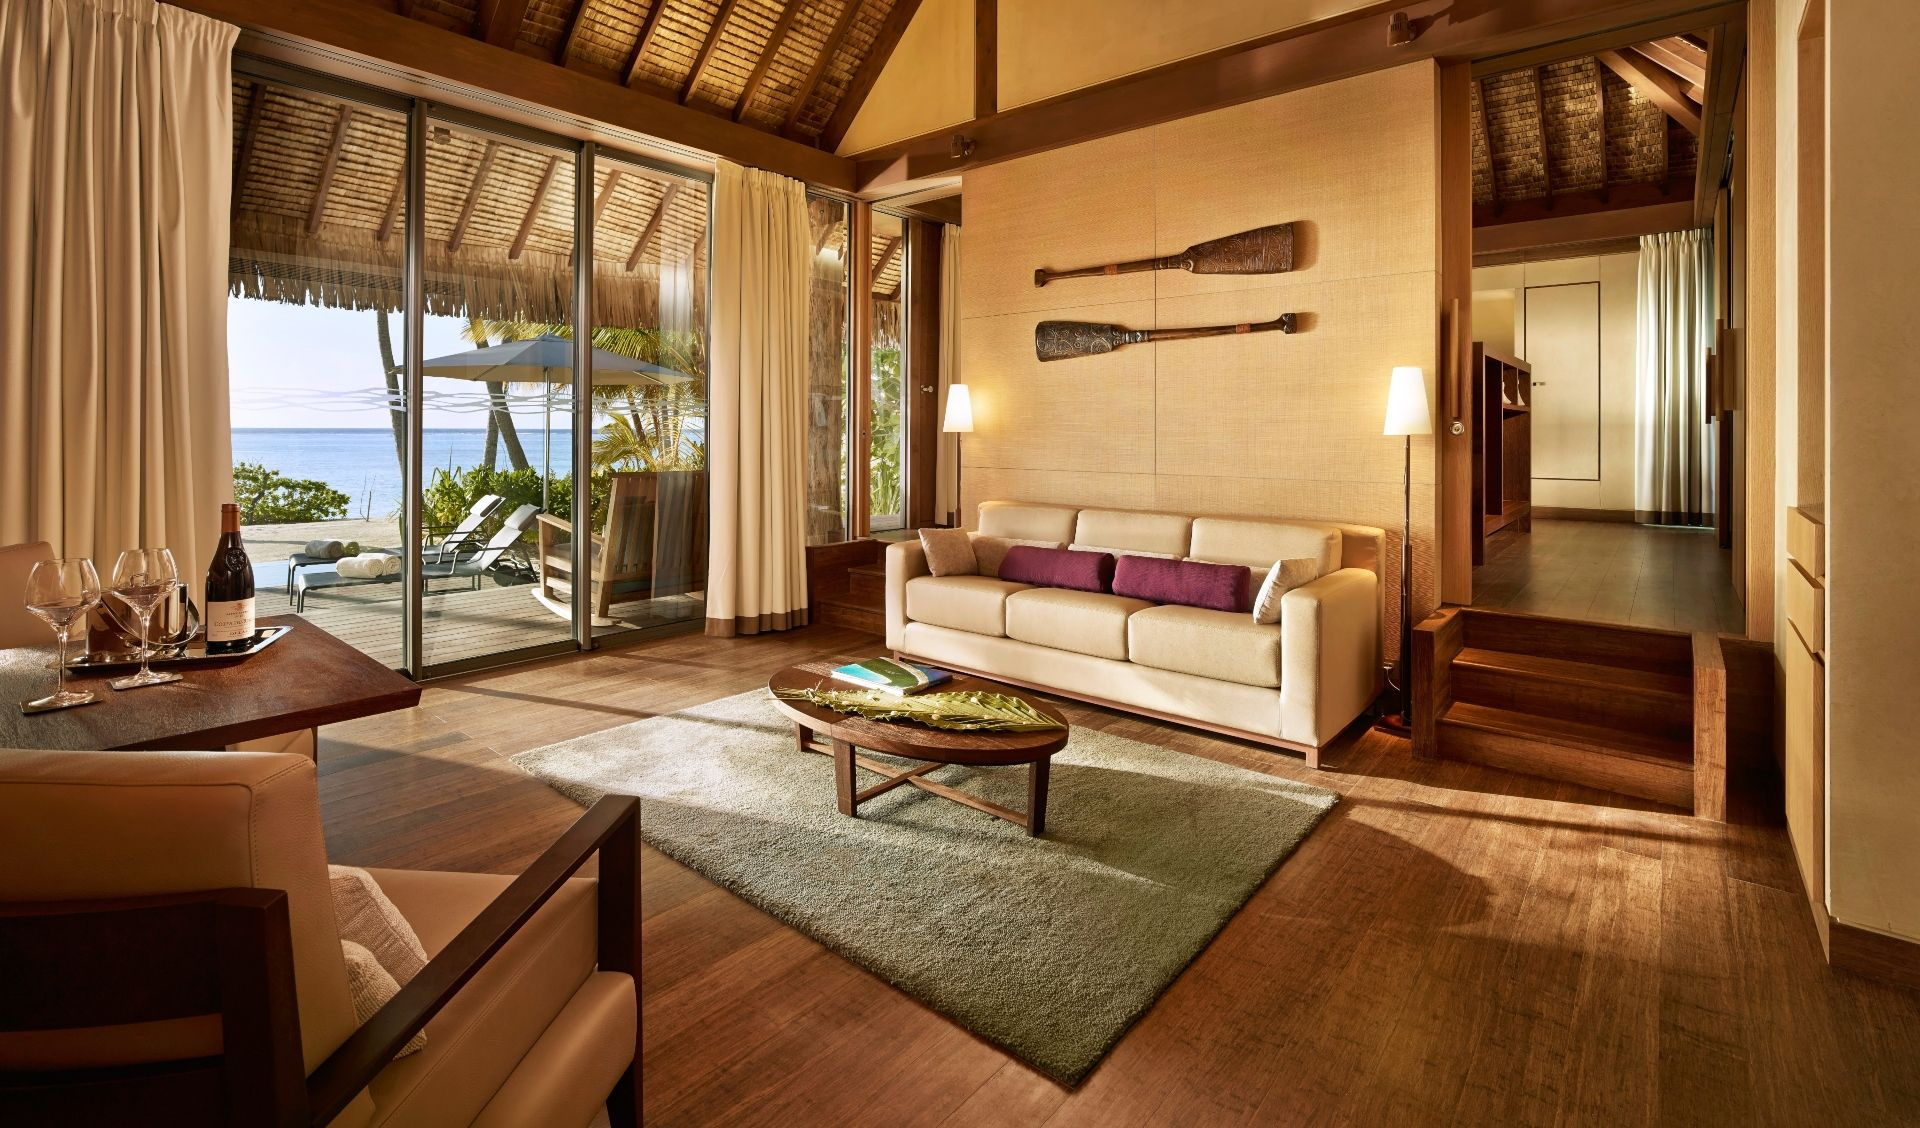 A One bedroom Villa living room